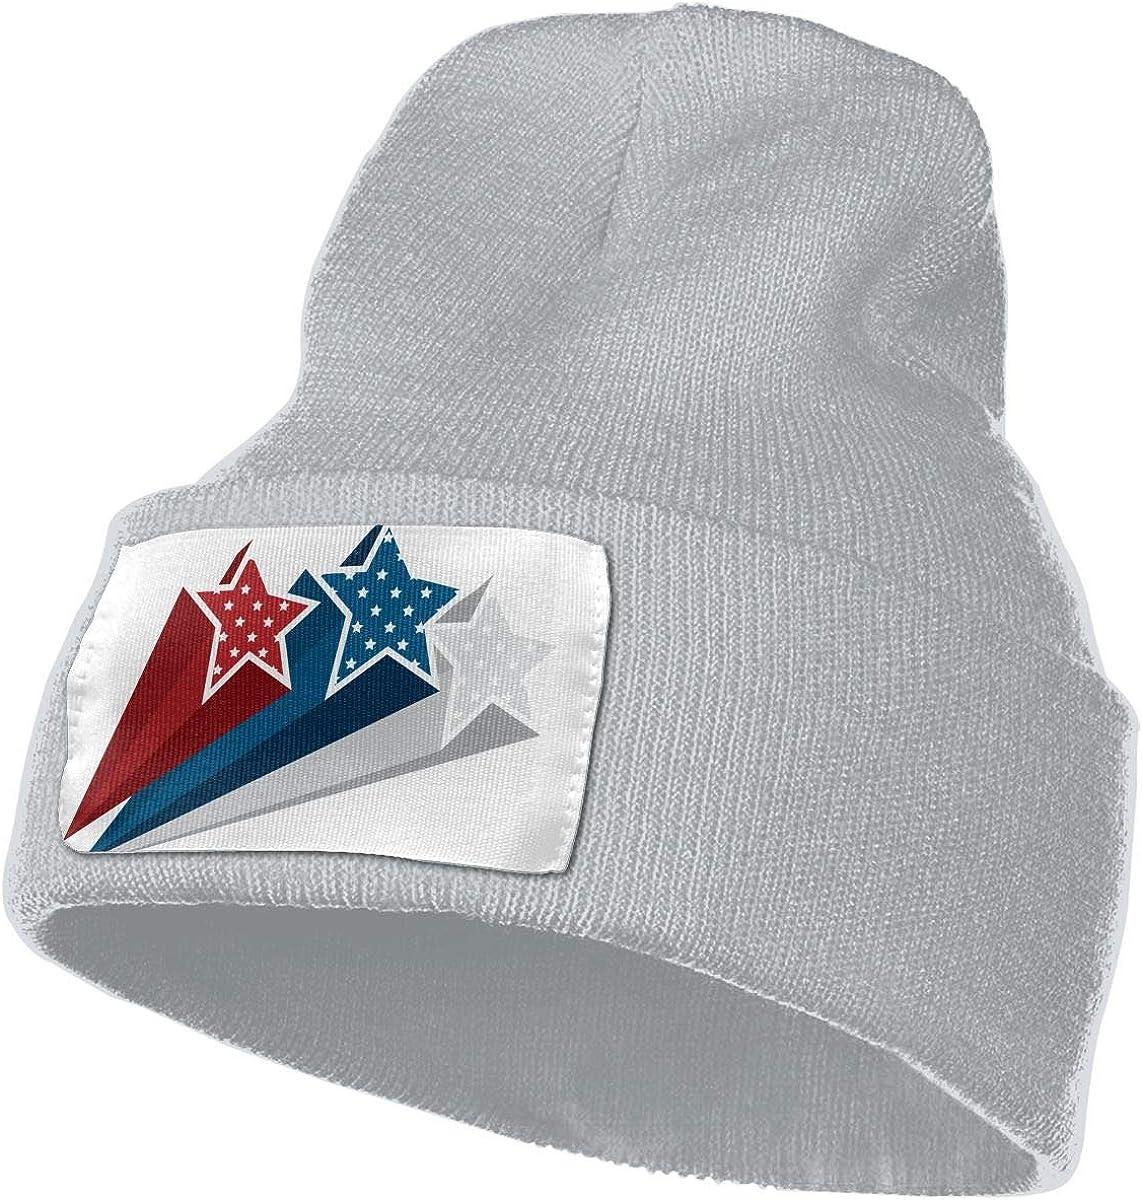 QZqDQ American Flag Star Unisex Fashion Knitted Hat Luxury Hip-Hop Cap